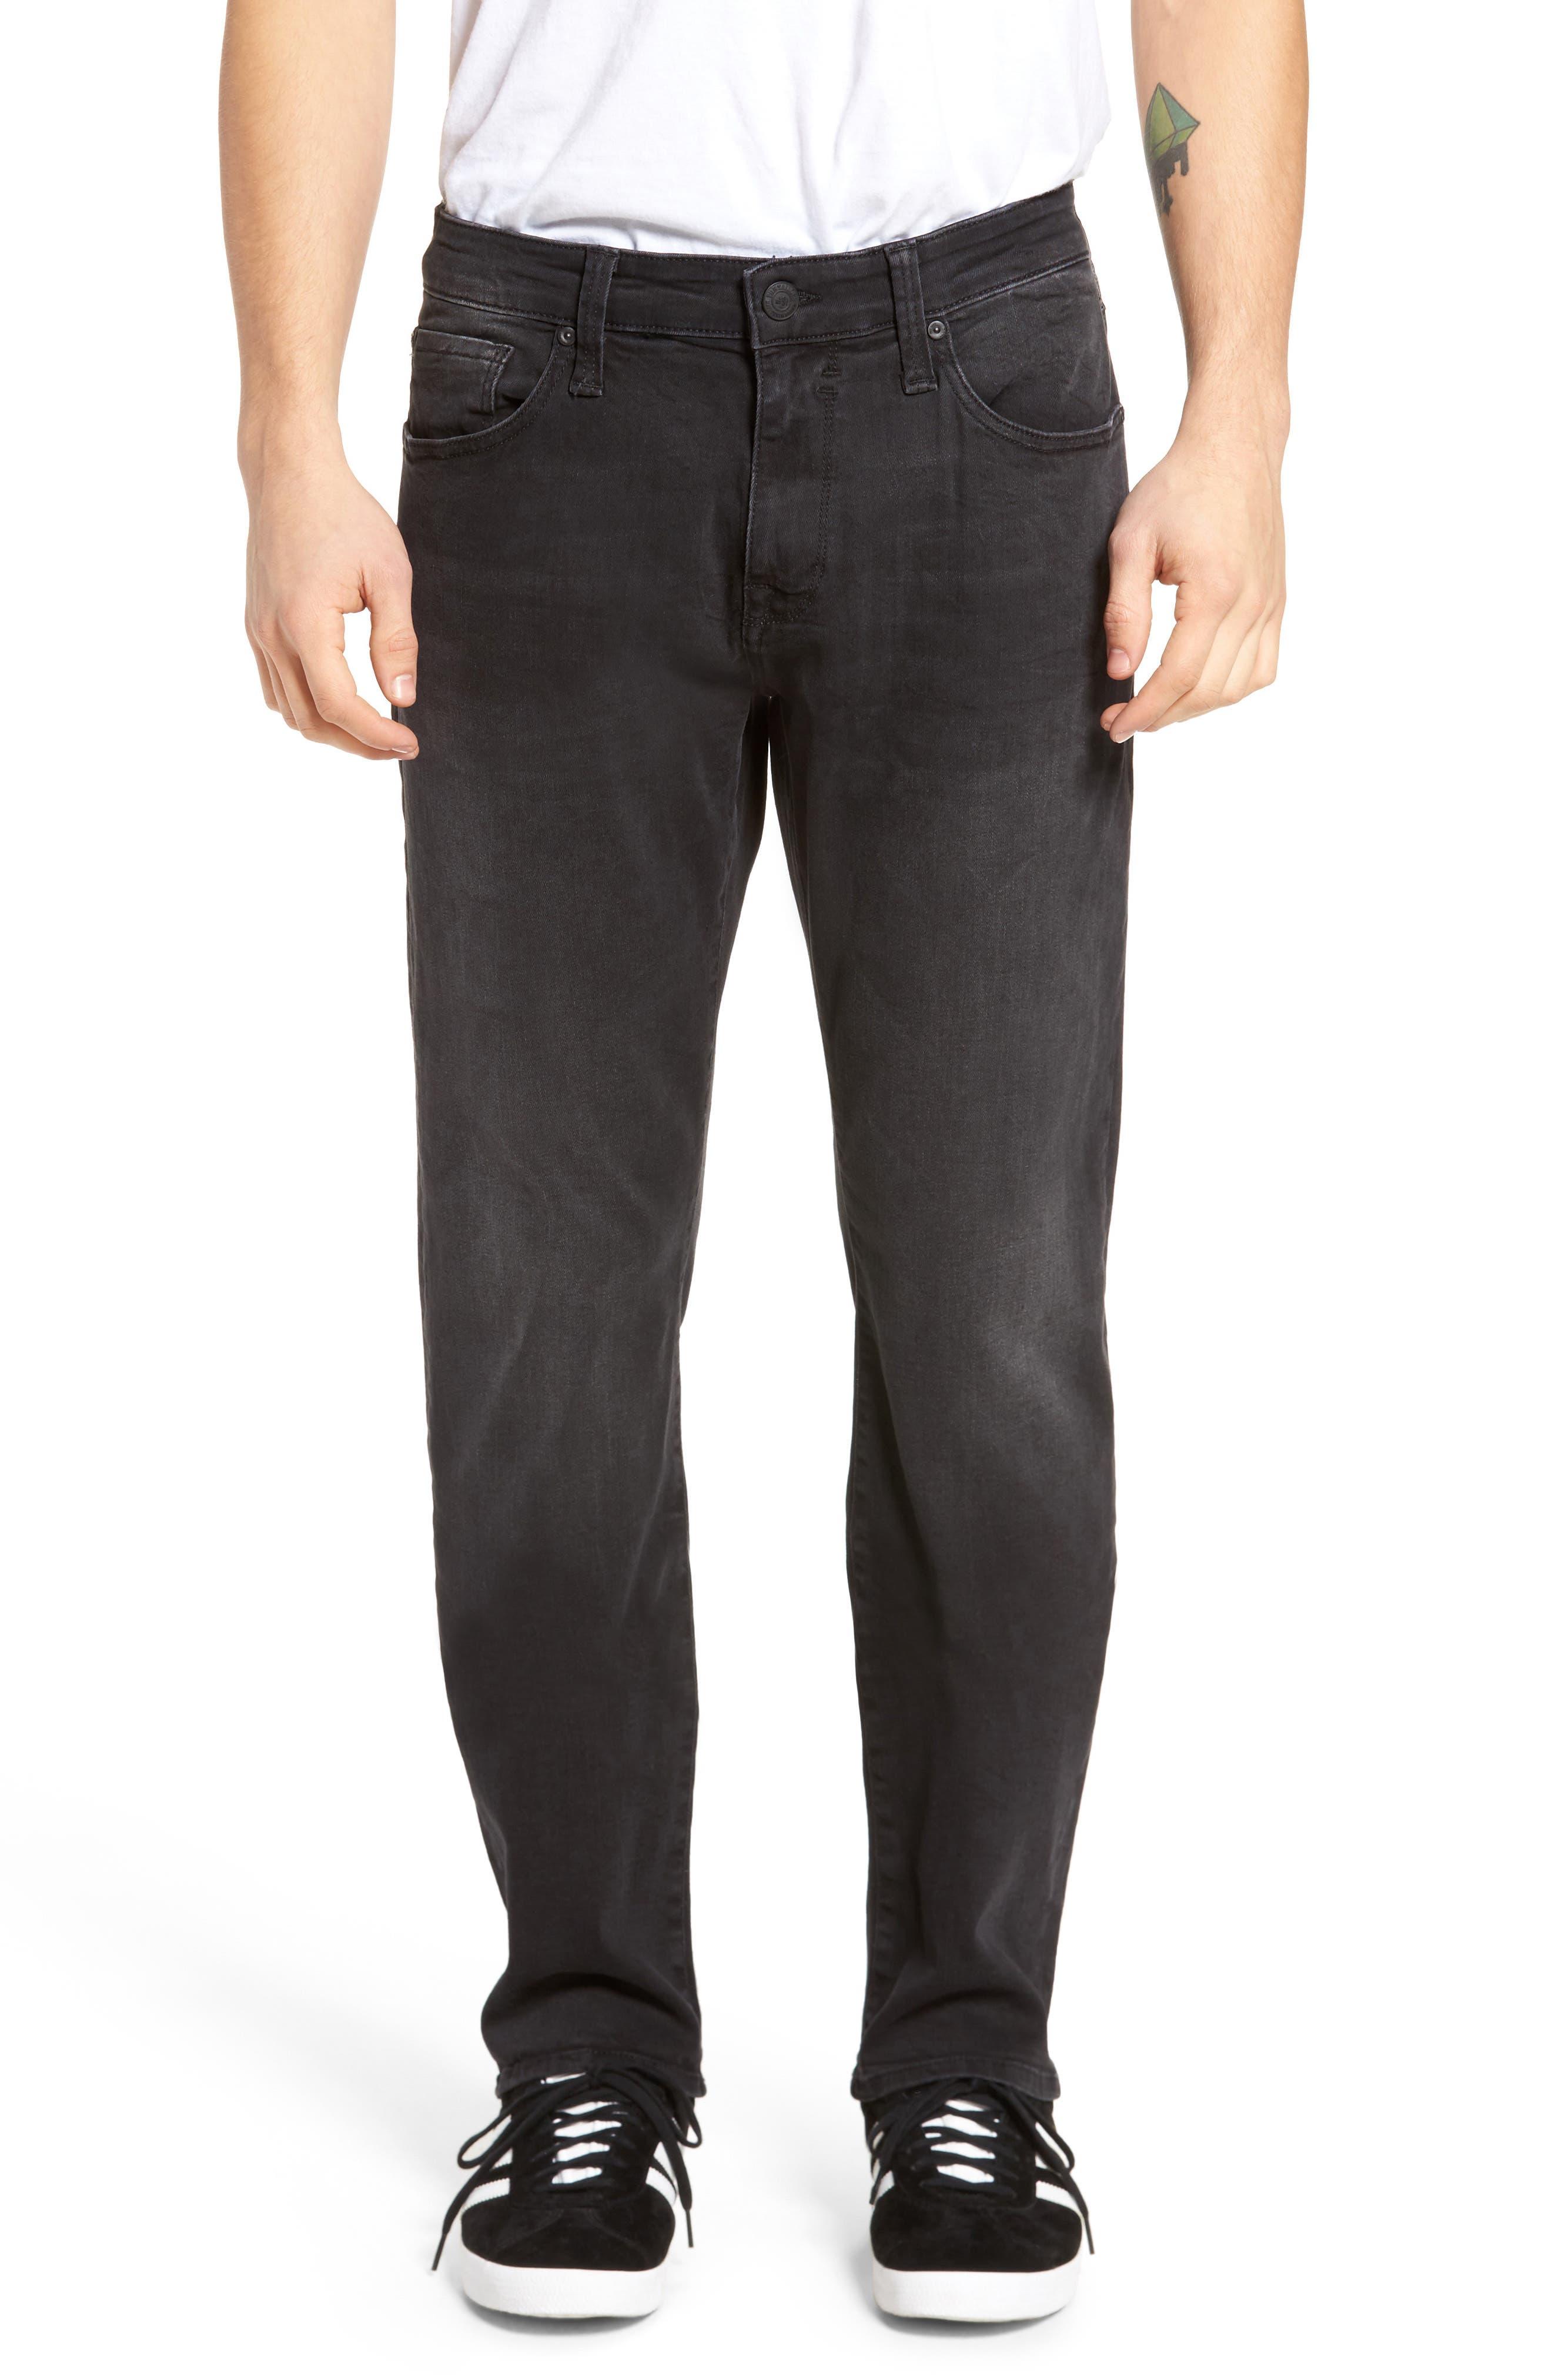 Main Image - Mavi Jeans Zach Straight Fit Jeans (Smoke Chelsea)